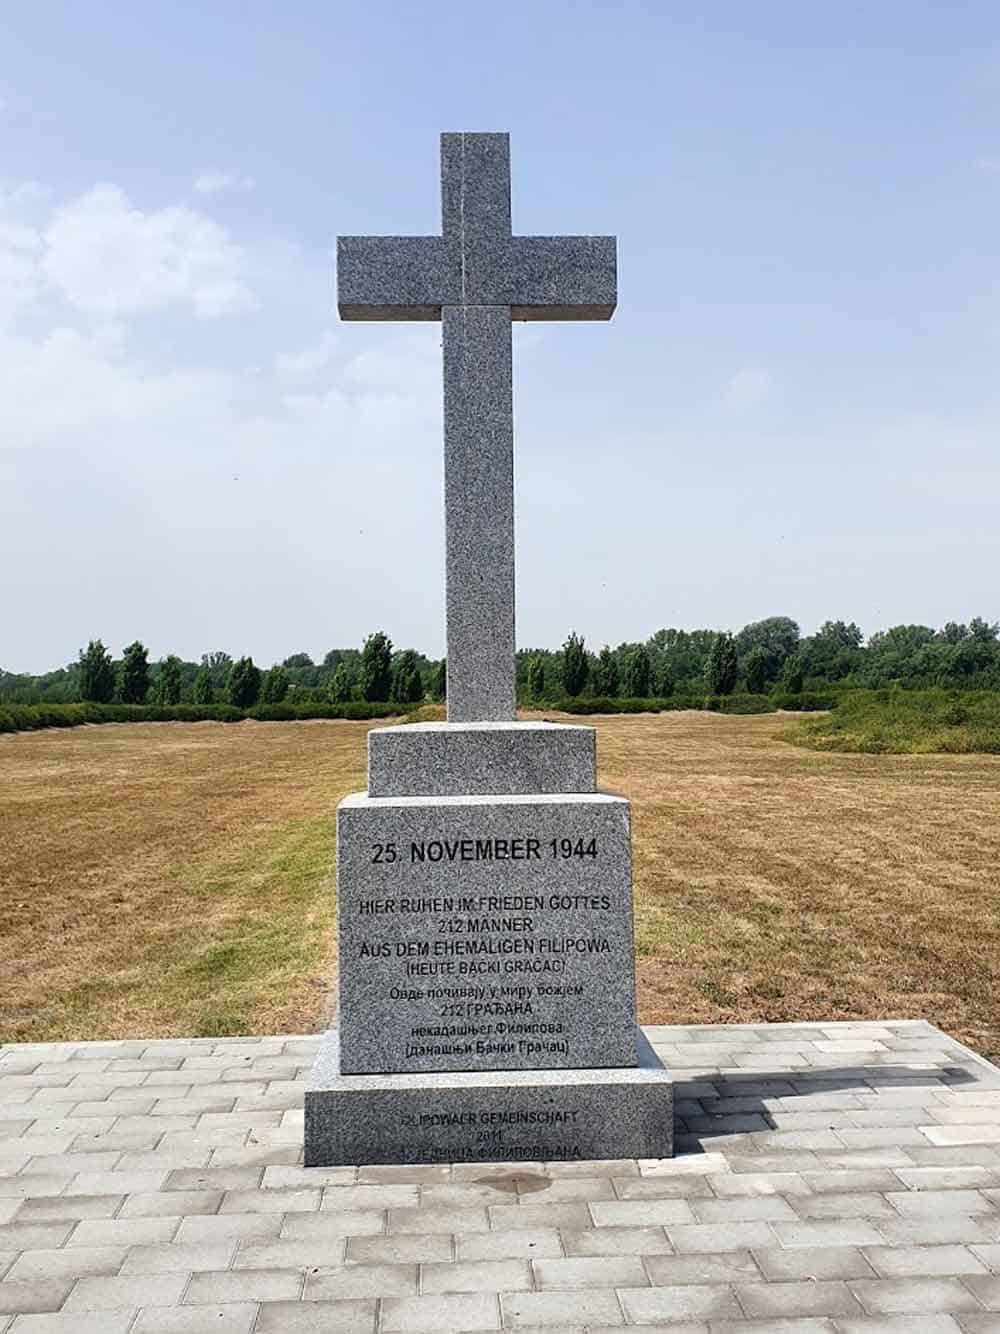 ZLOČIN IZ RATA Krst u sećanje na streljane nemačke civile 25. novembra 1944.